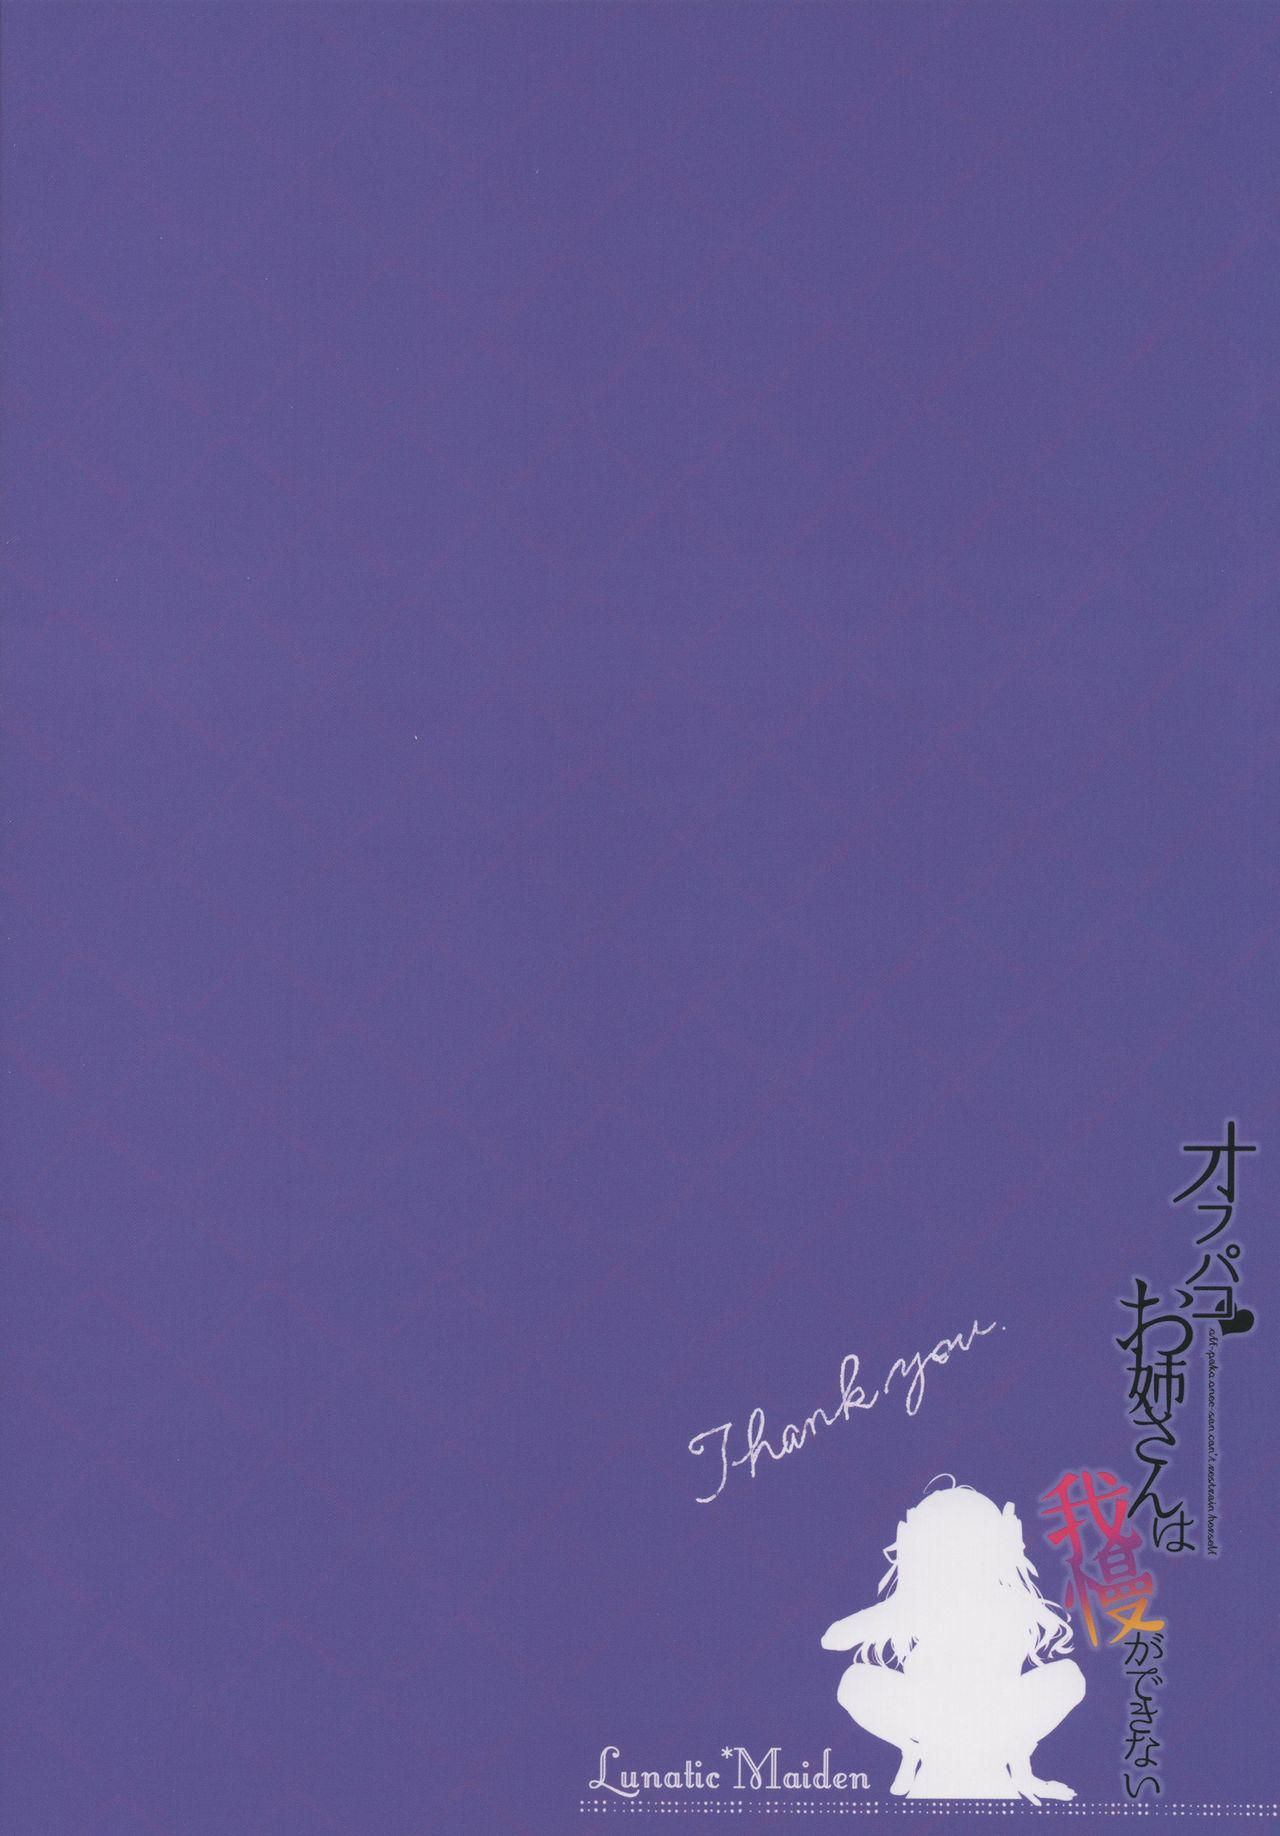 (C96) [Lunatic*Maiden (Poruno Ibuki)] Off-Pako Onee-san wa Gaman ga Dekinai | The Girl I Met Online Can't Restrain Herself [English] [RedLantern] 26